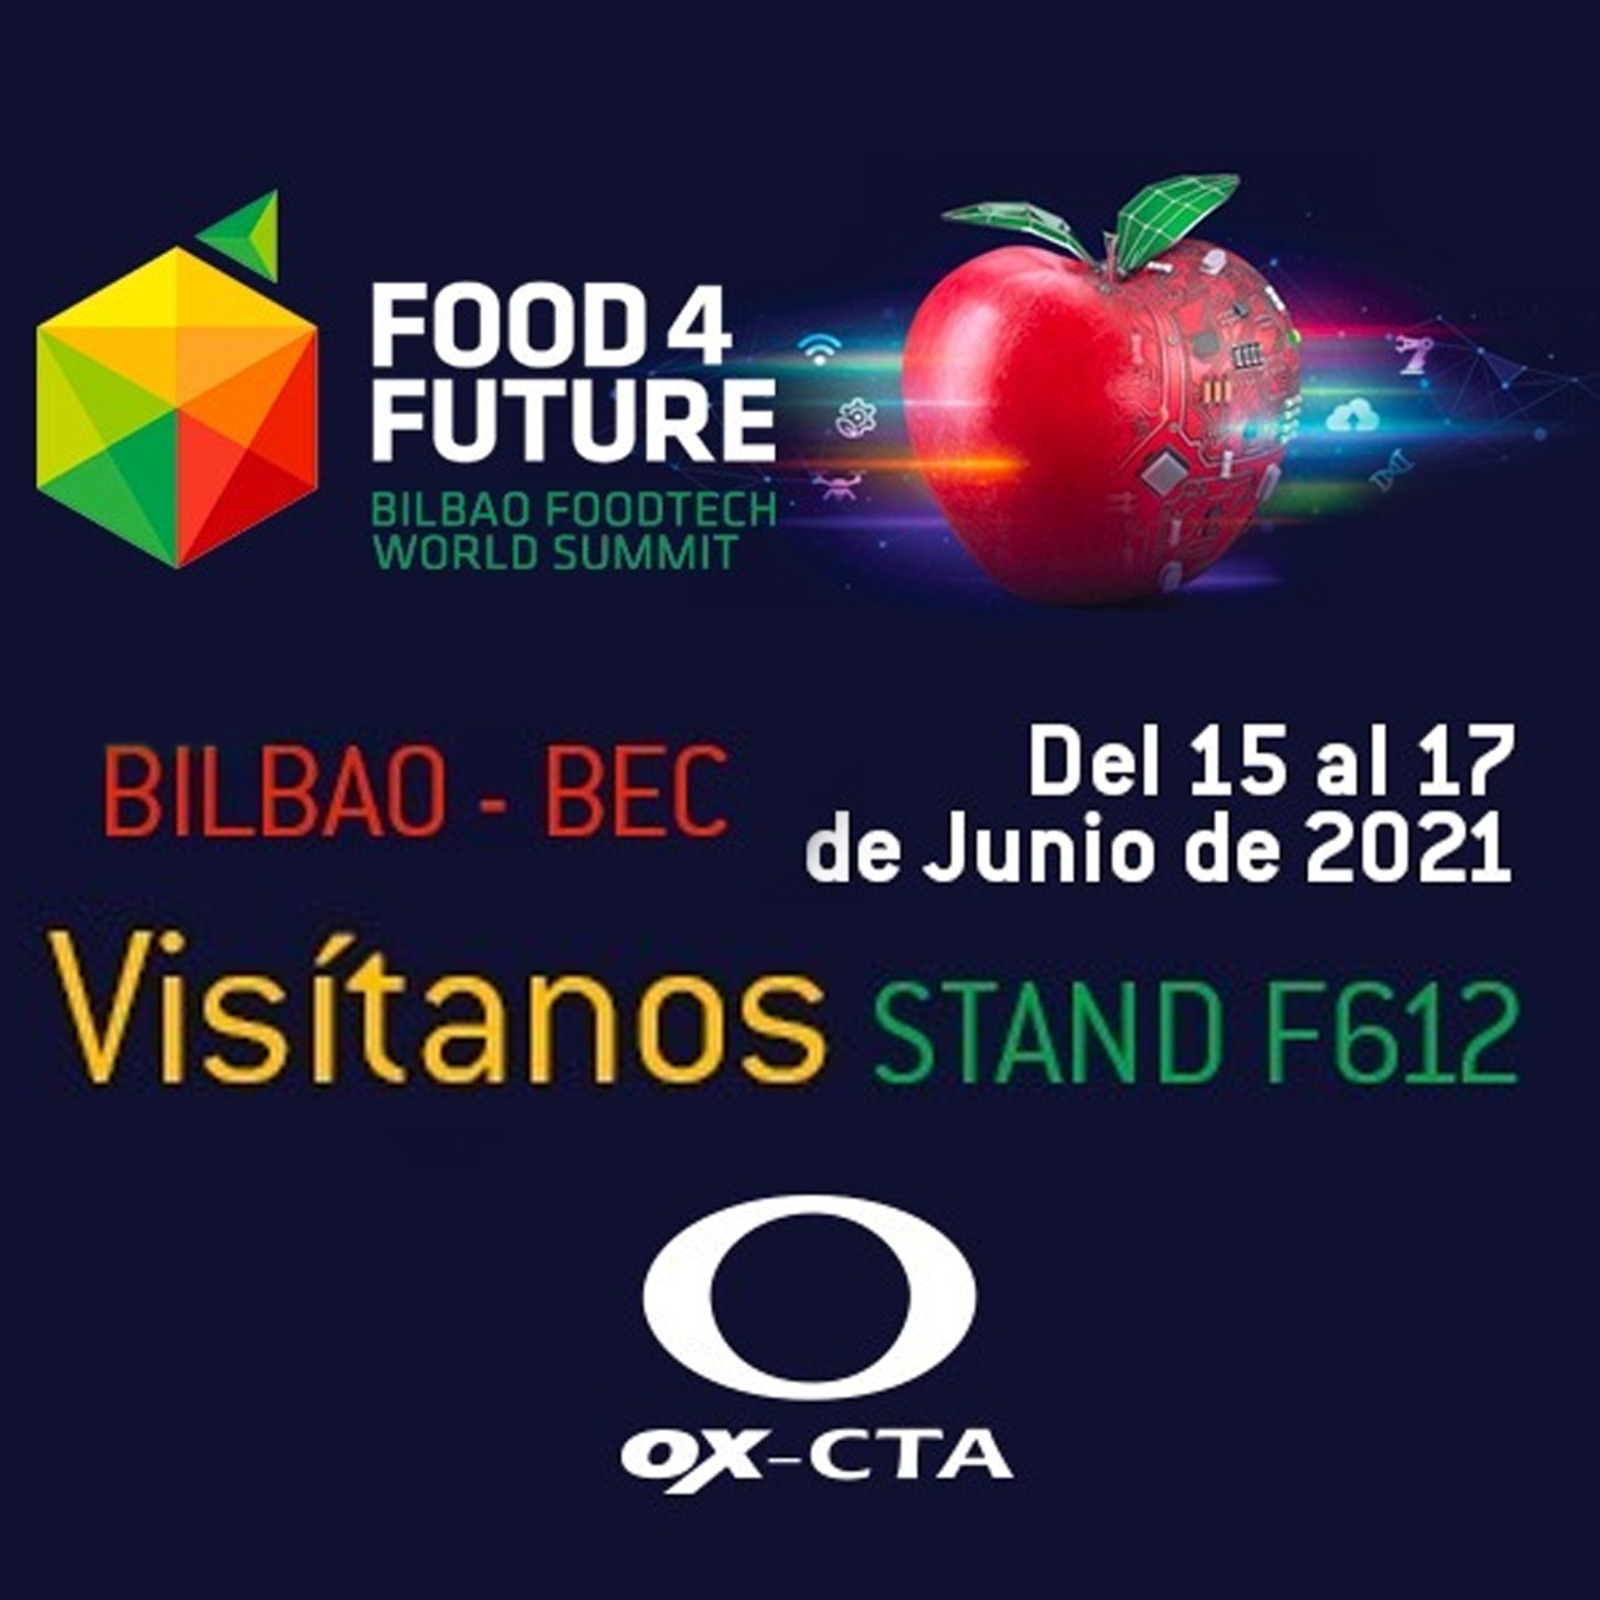 OX-CTA y FOOD 4 FUTURE